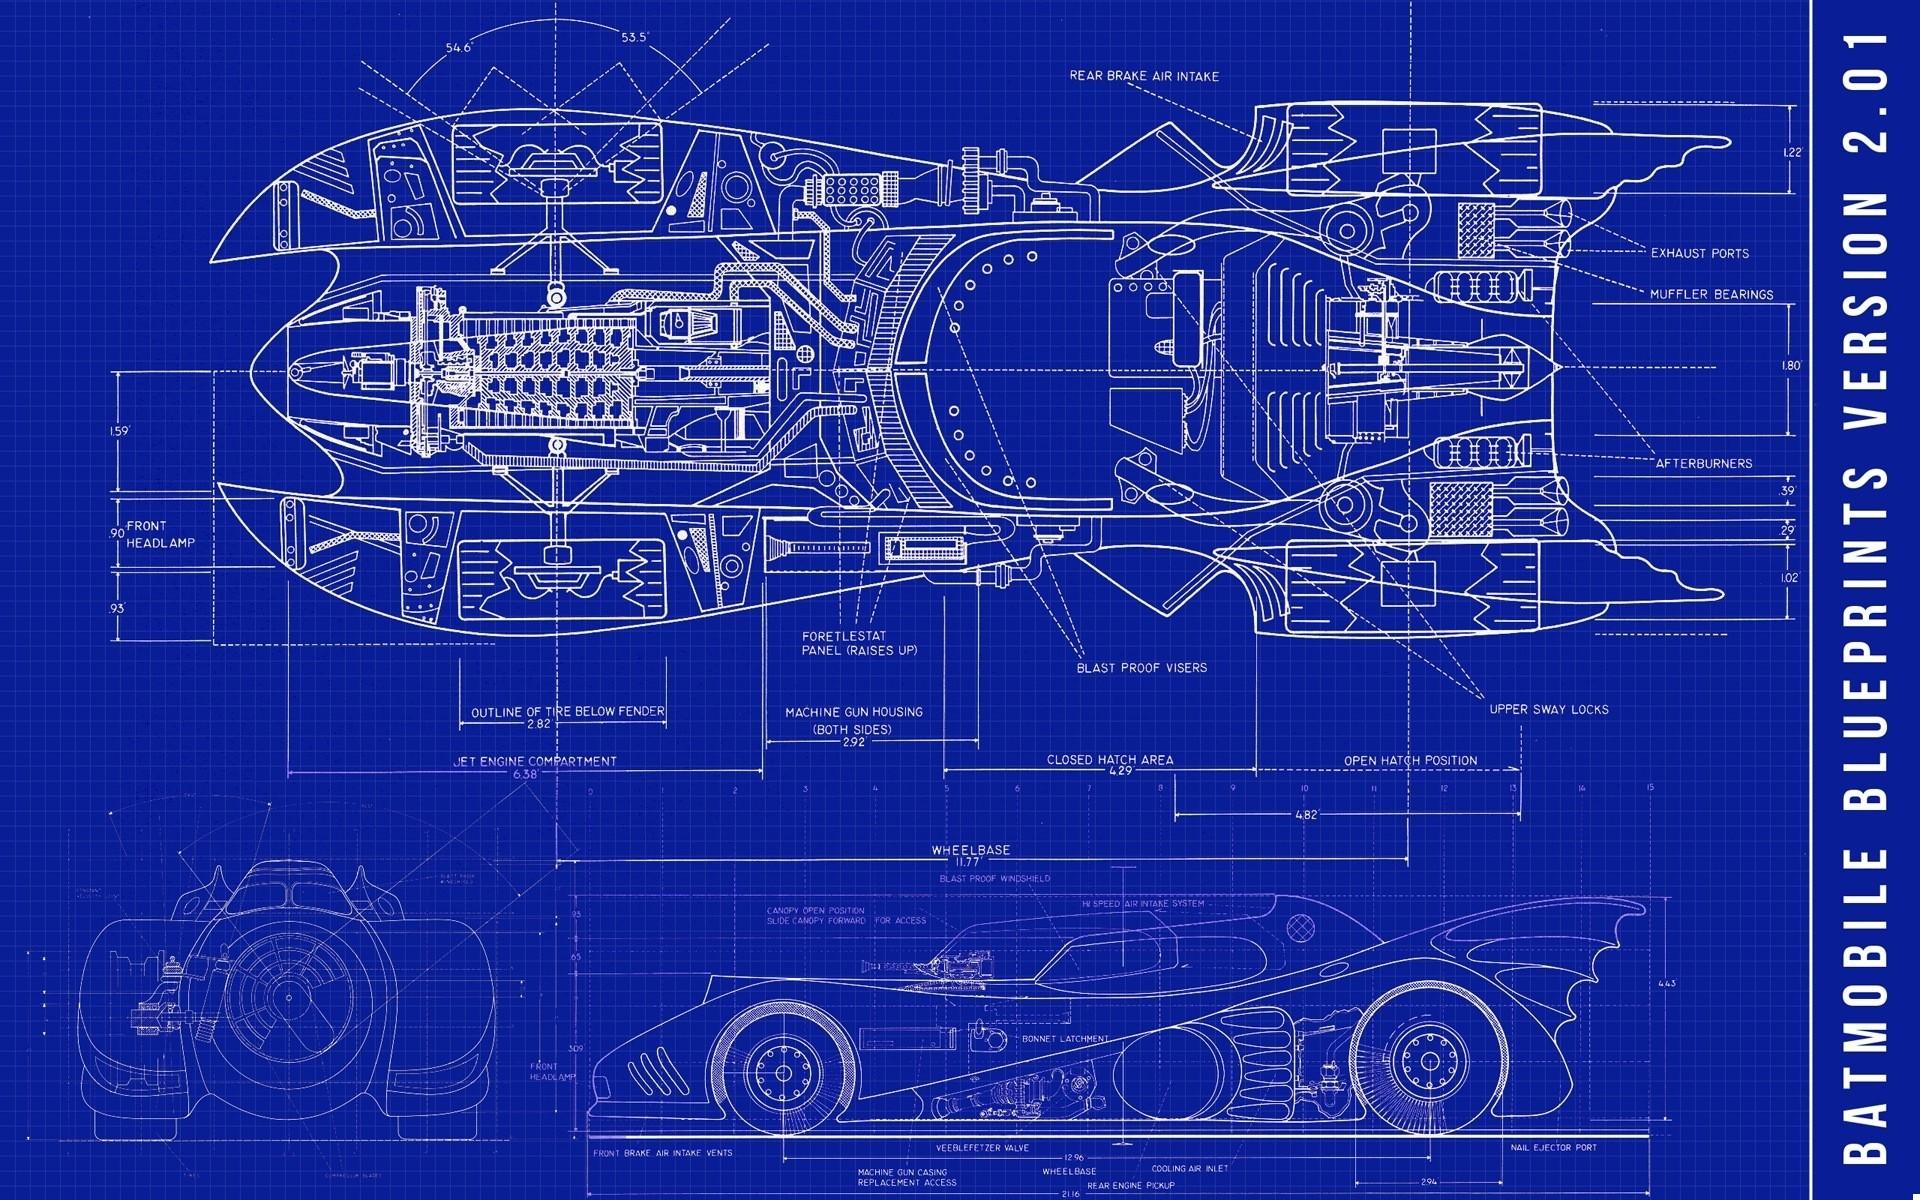 Hintergrundbilder : 1920x1200 px, Batman Autos, Batmobile ...